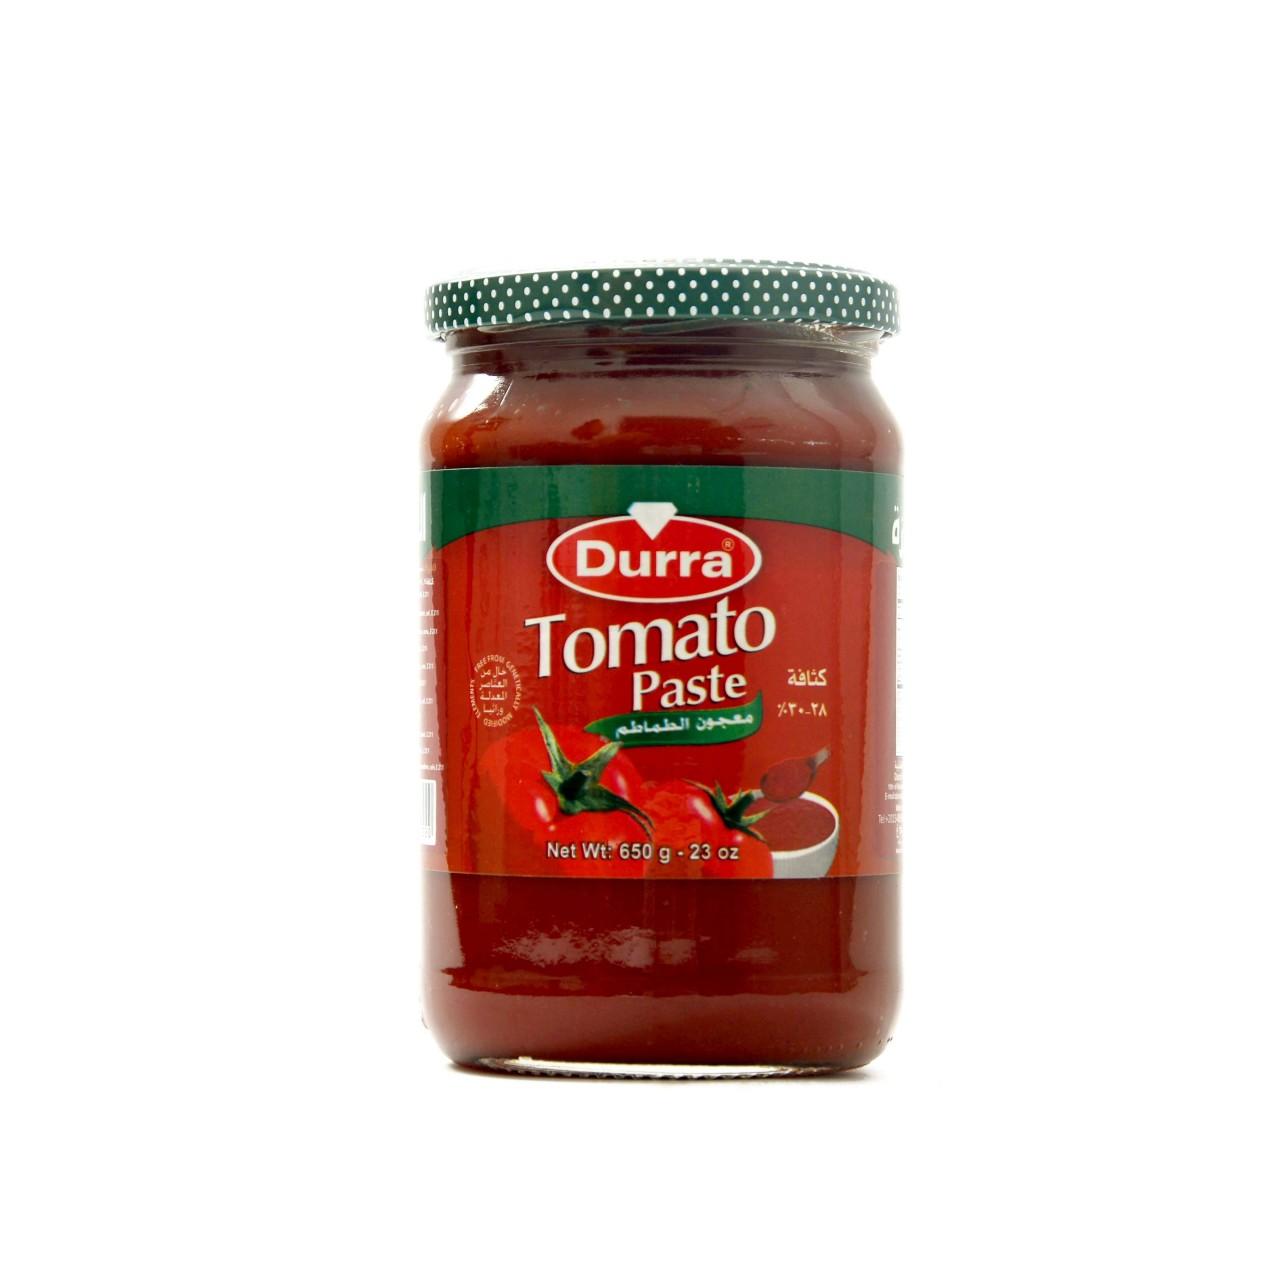 Durra Tomato Paste